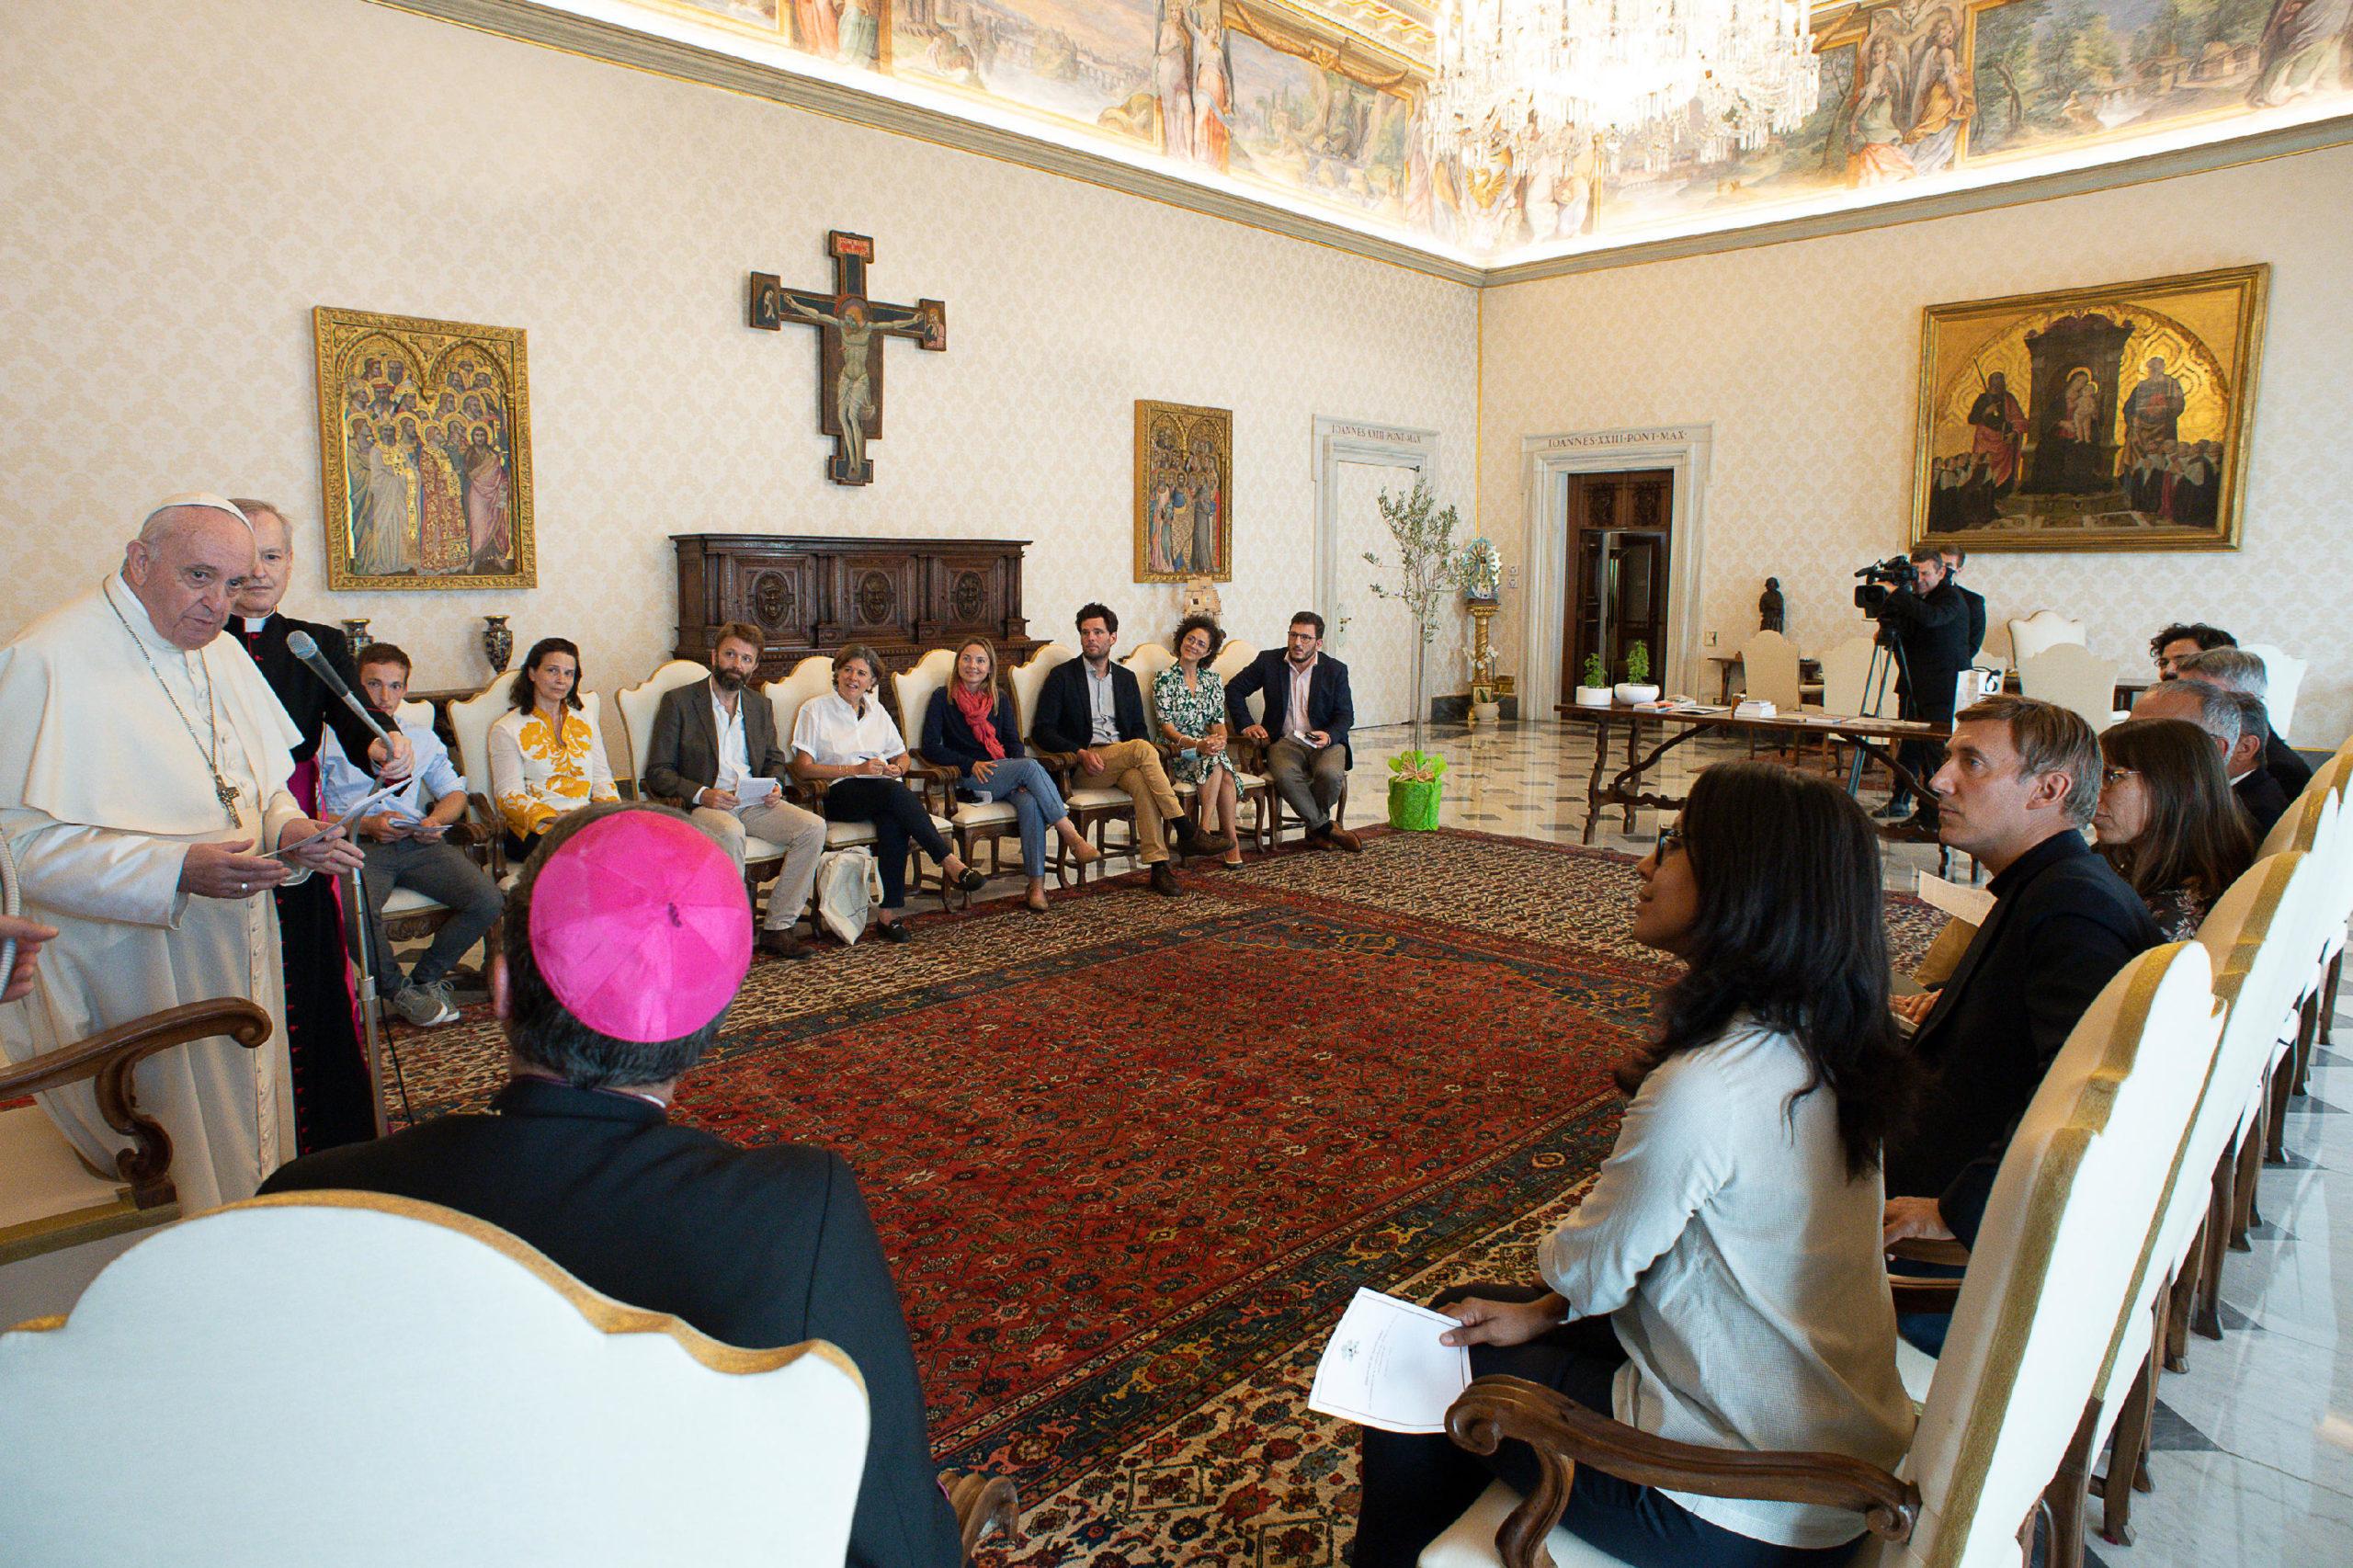 Groupe de français venus parler écologie, 3 septembre 2020© Vatican Media